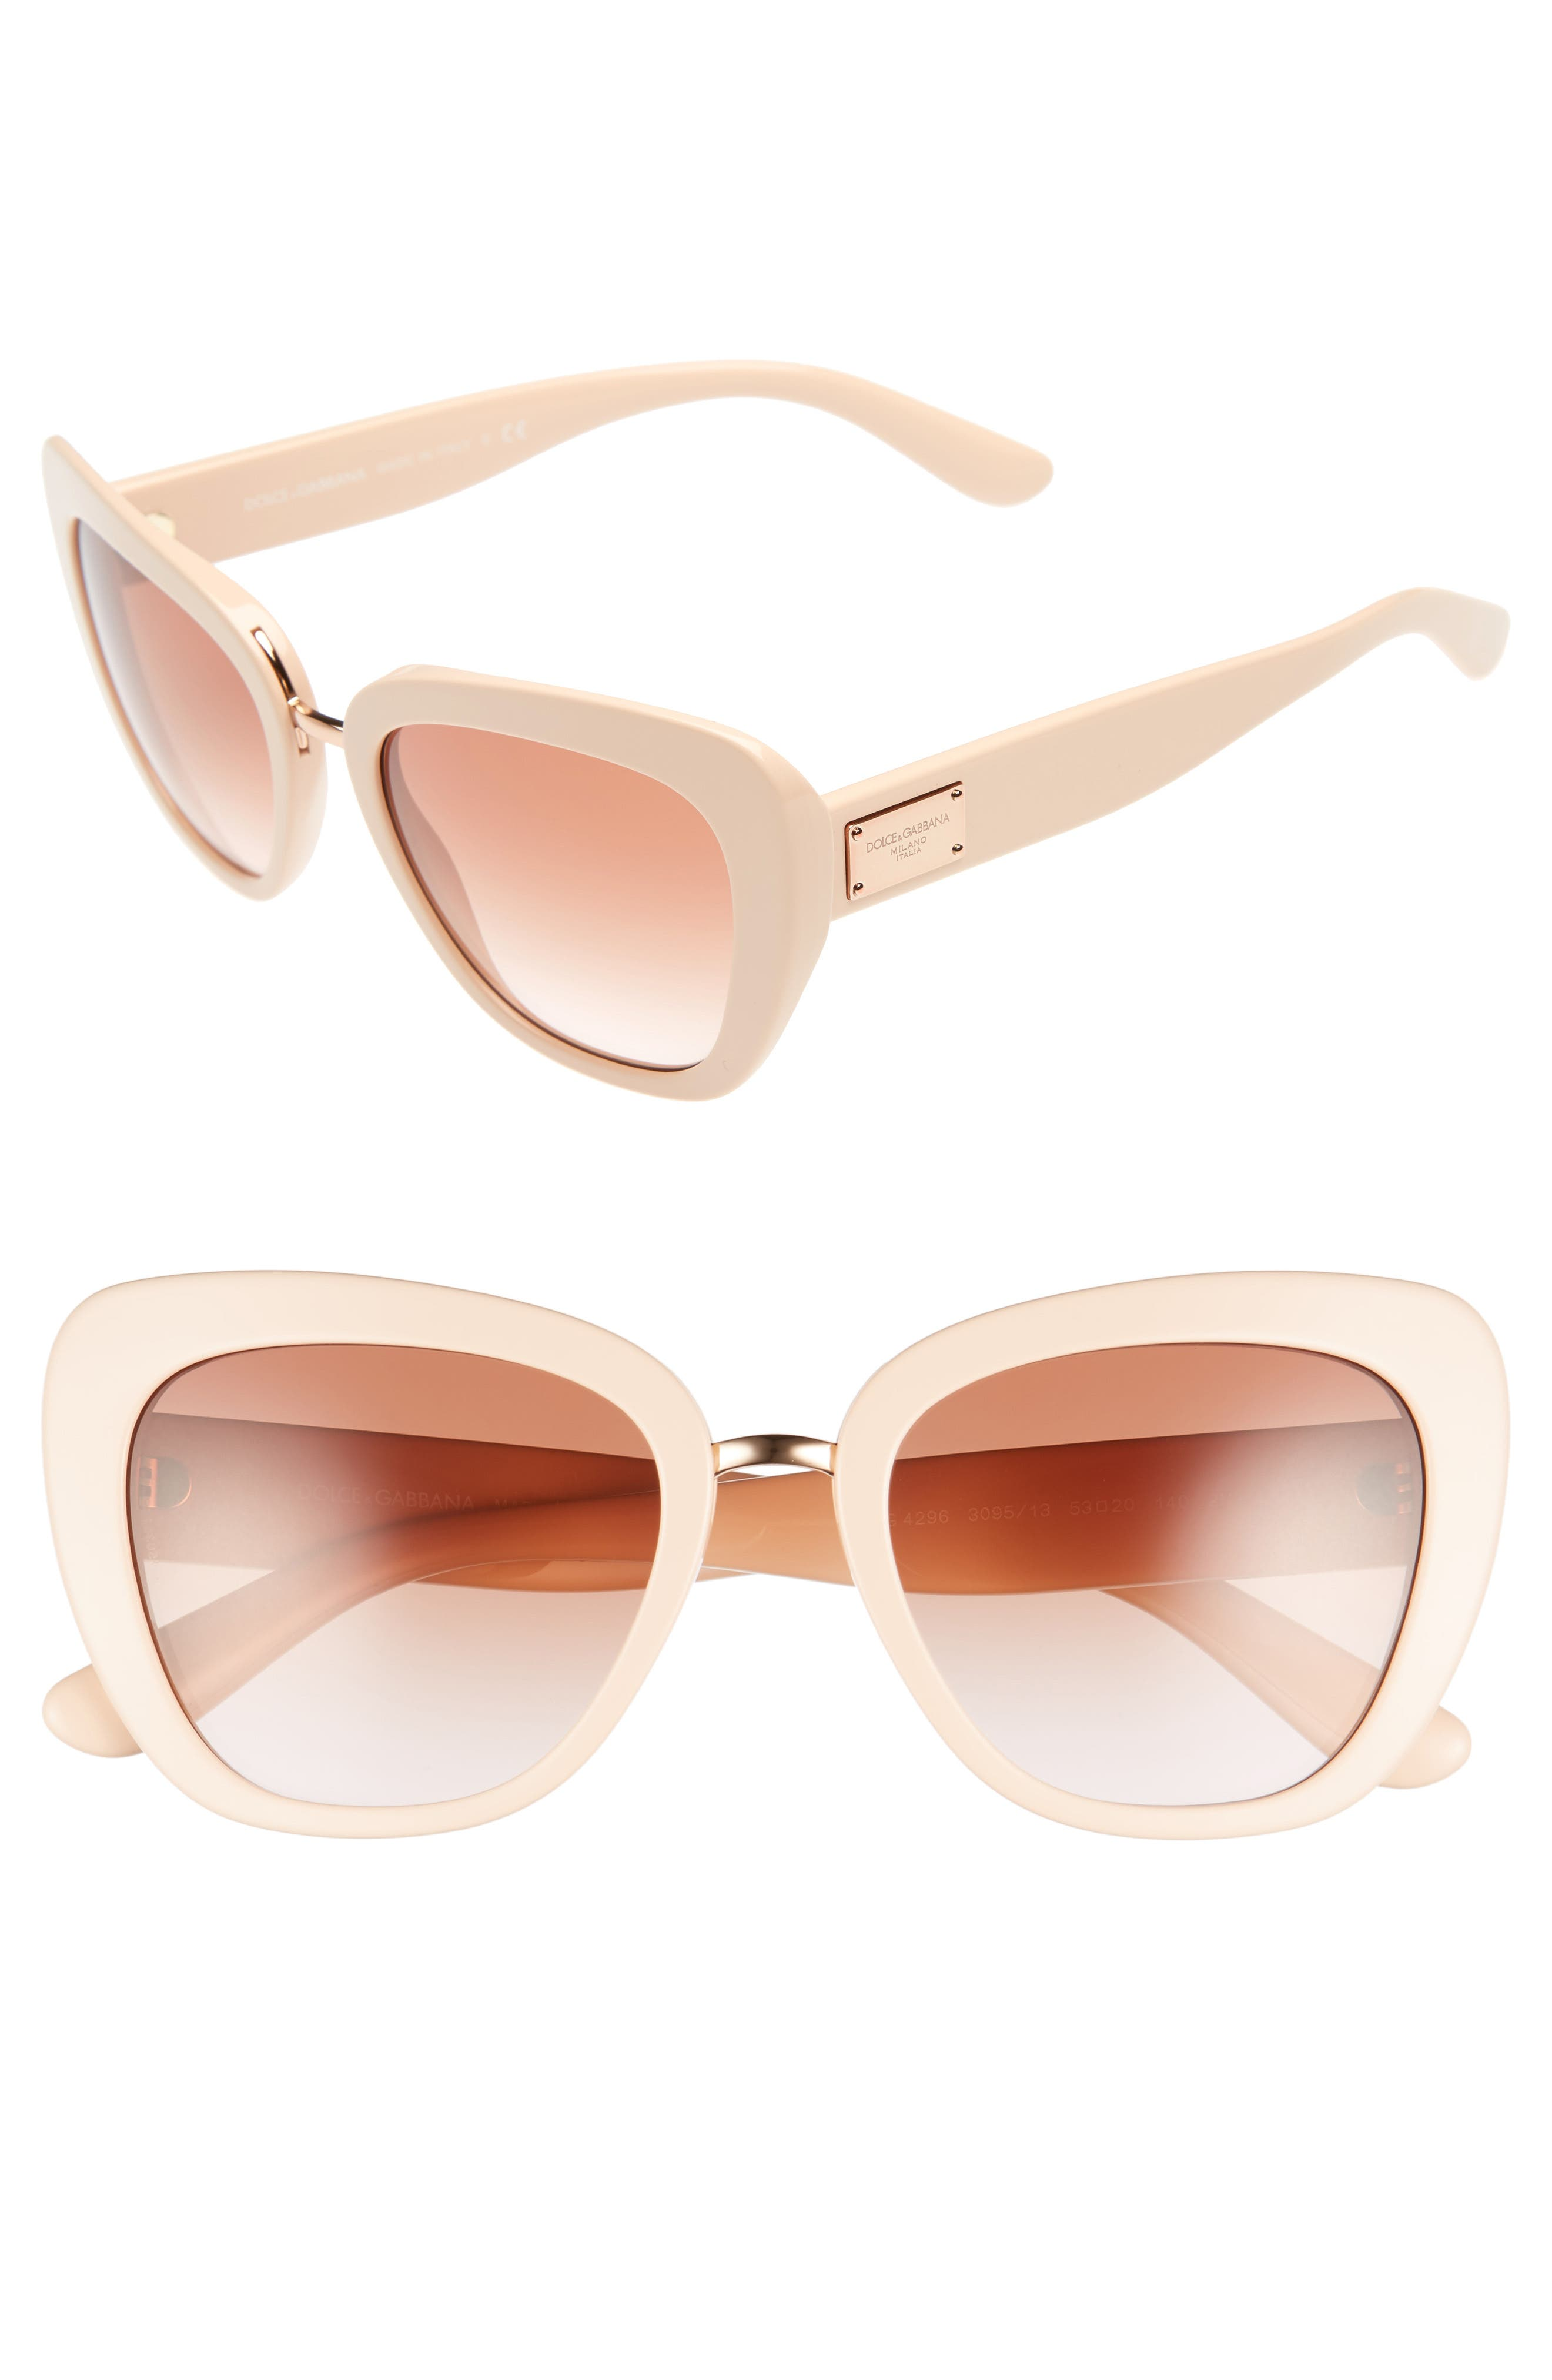 Alternate Image 1 Selected - Dolce&Gabbana 53mm Gradient Cat Eye Sunglasses